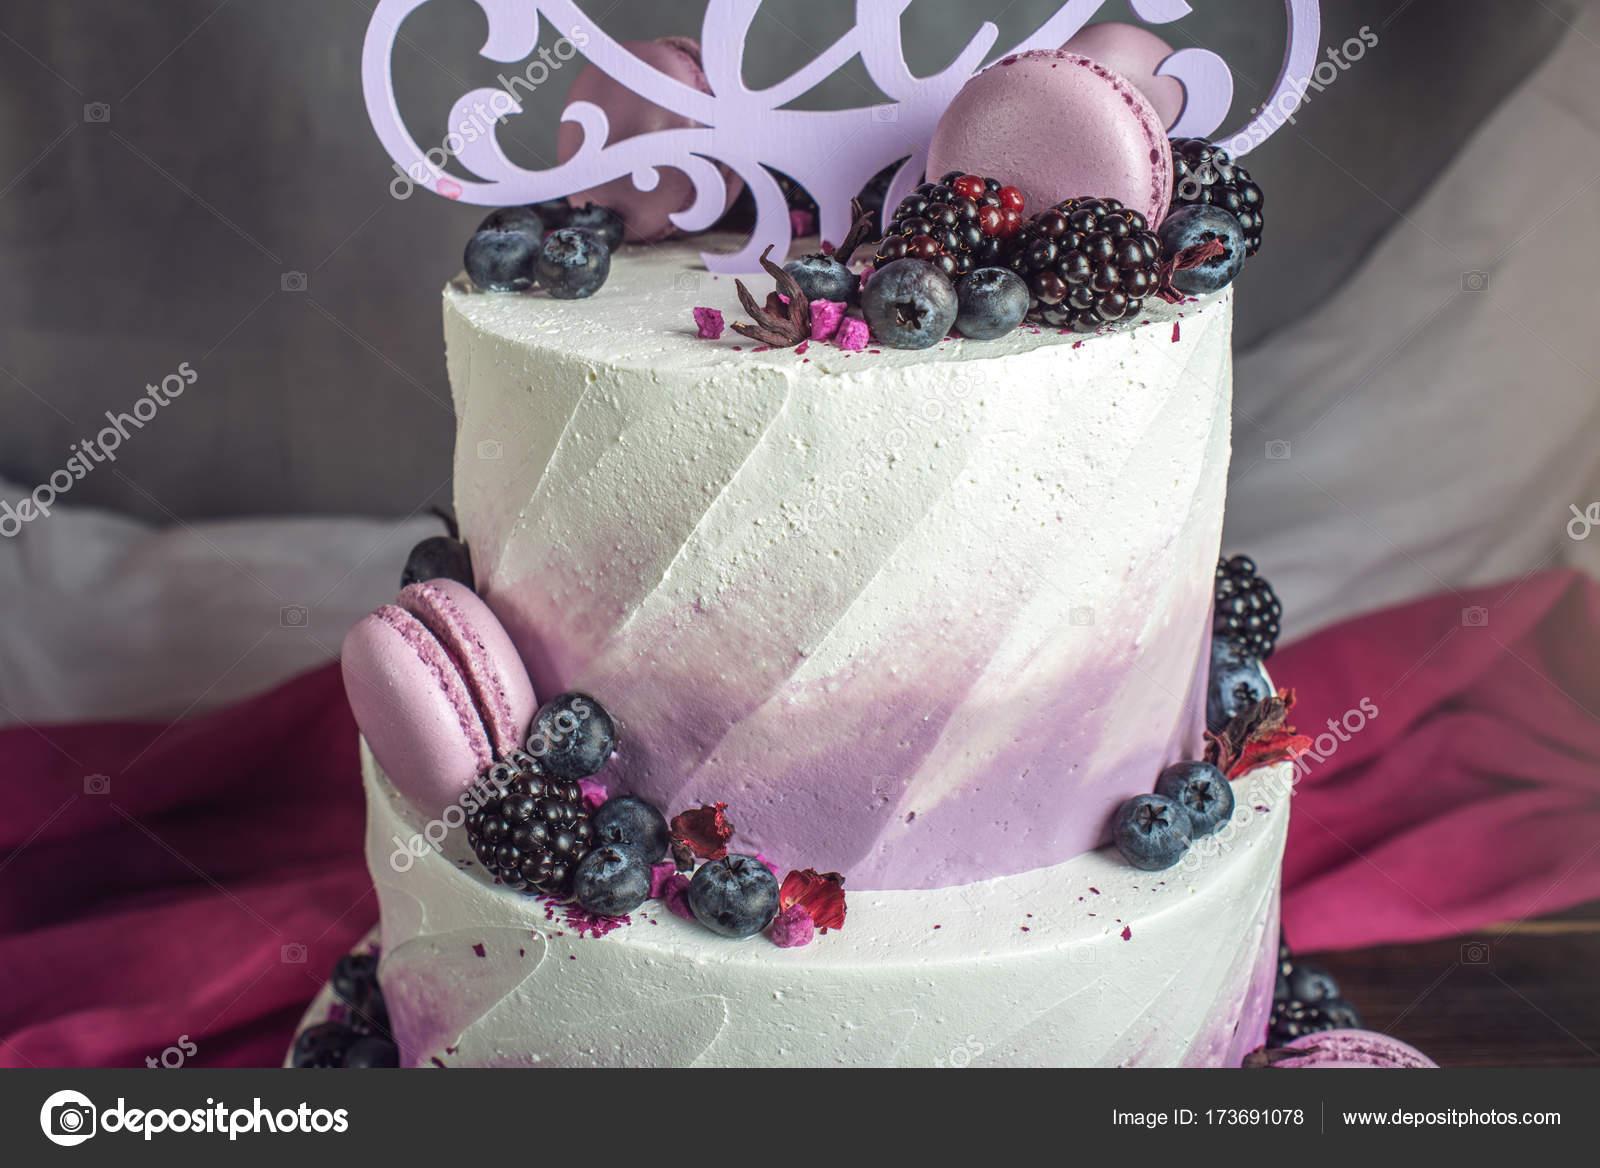 Schonen Leckeren Dreistockige Hochzeitstorte Dekoriert Mit Beeren